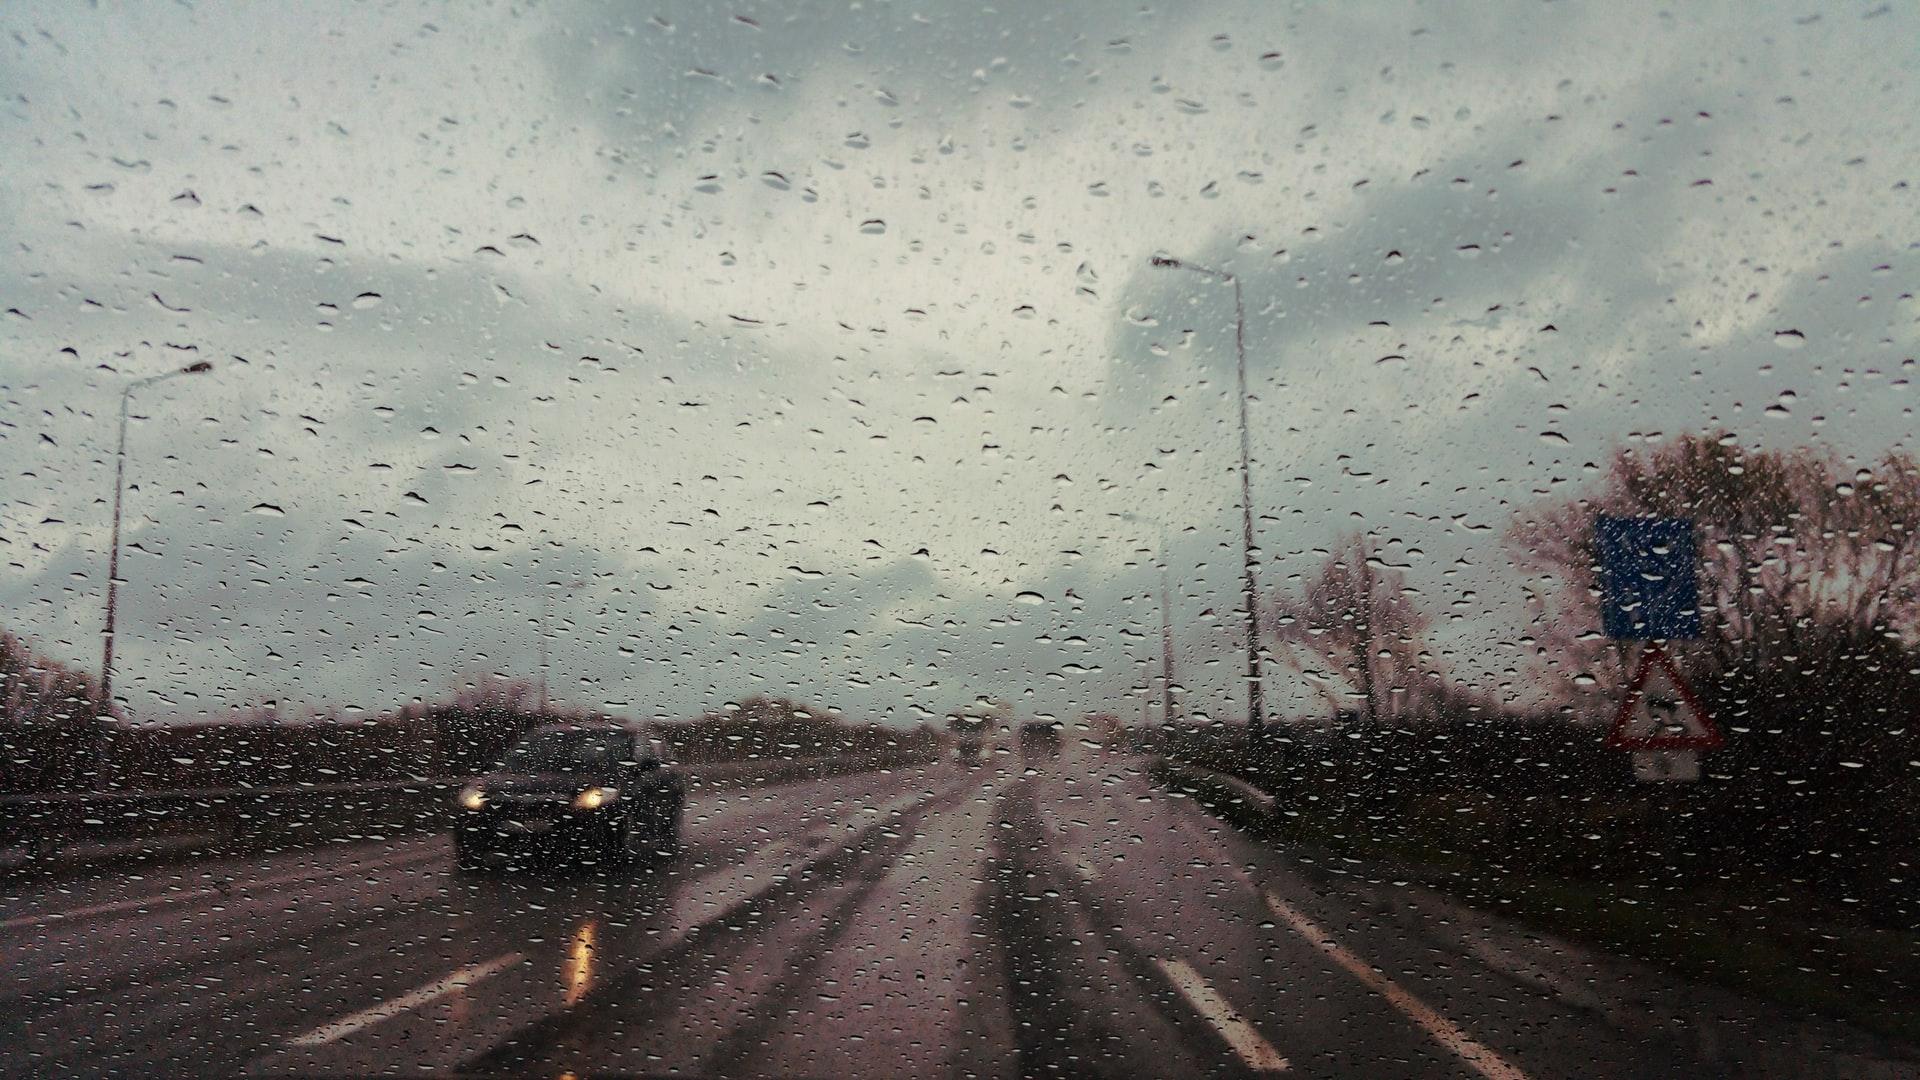 rainy road through car windscreen